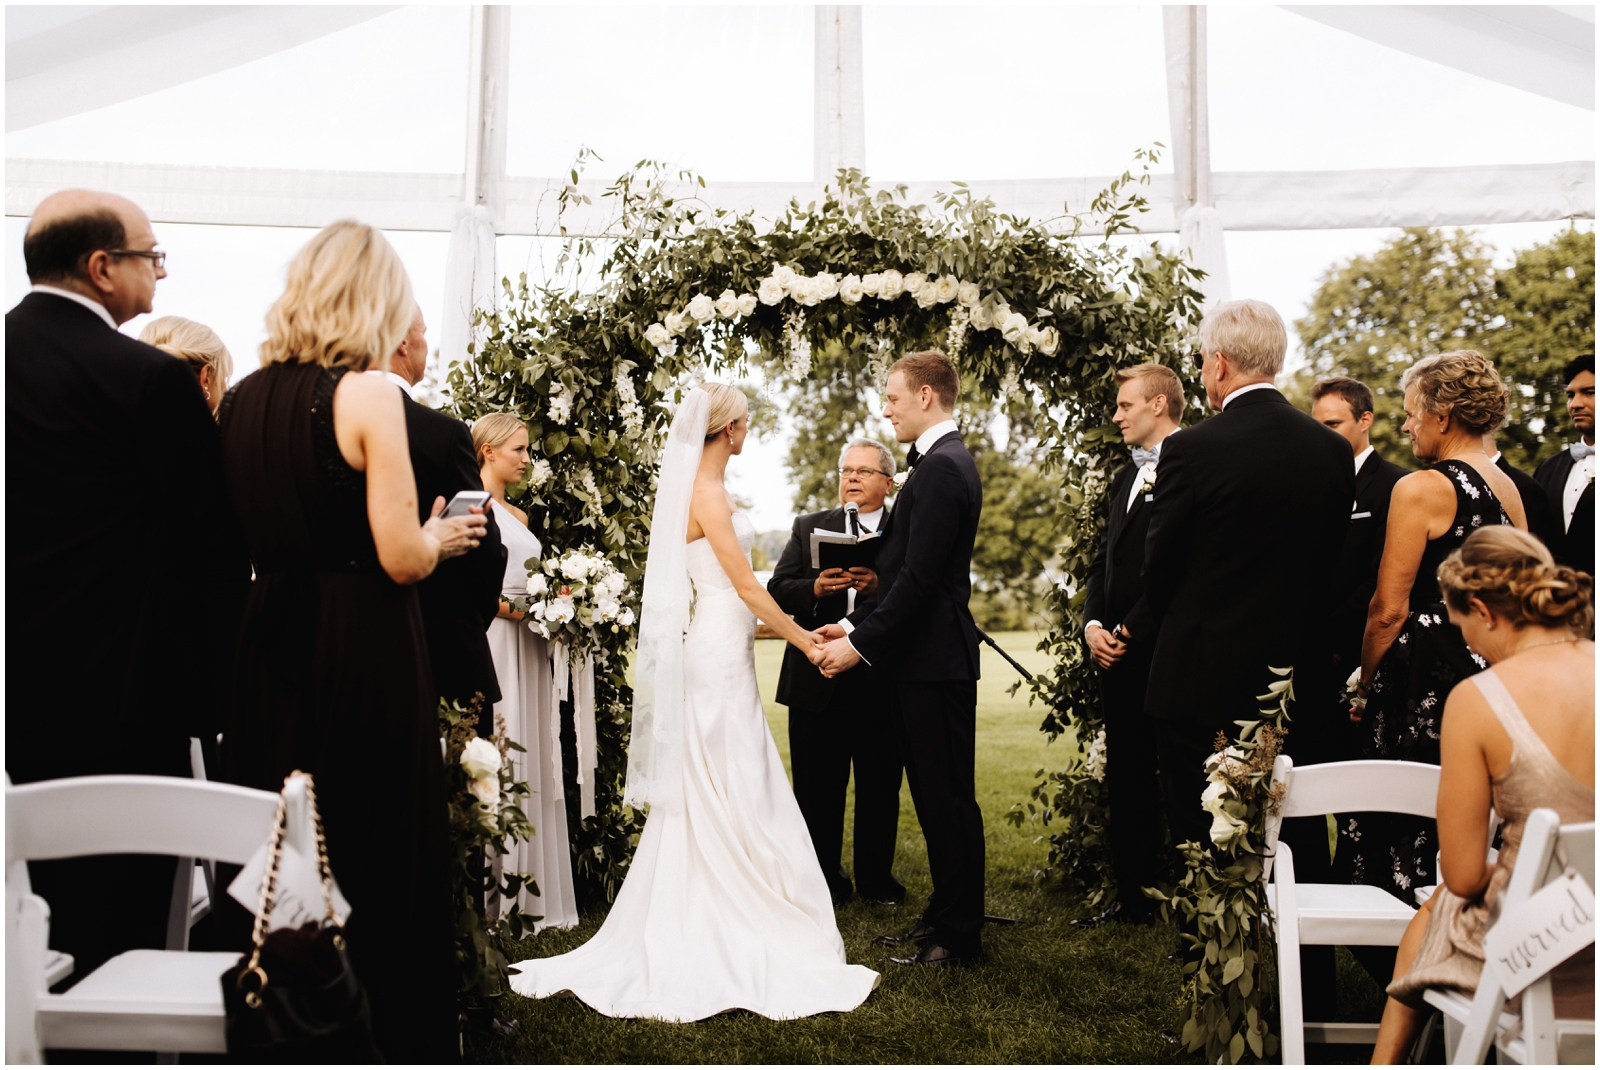 Minnesota Wedding Planner. Lafayette Club Wedding. Bride and groom during their wedding ceremony